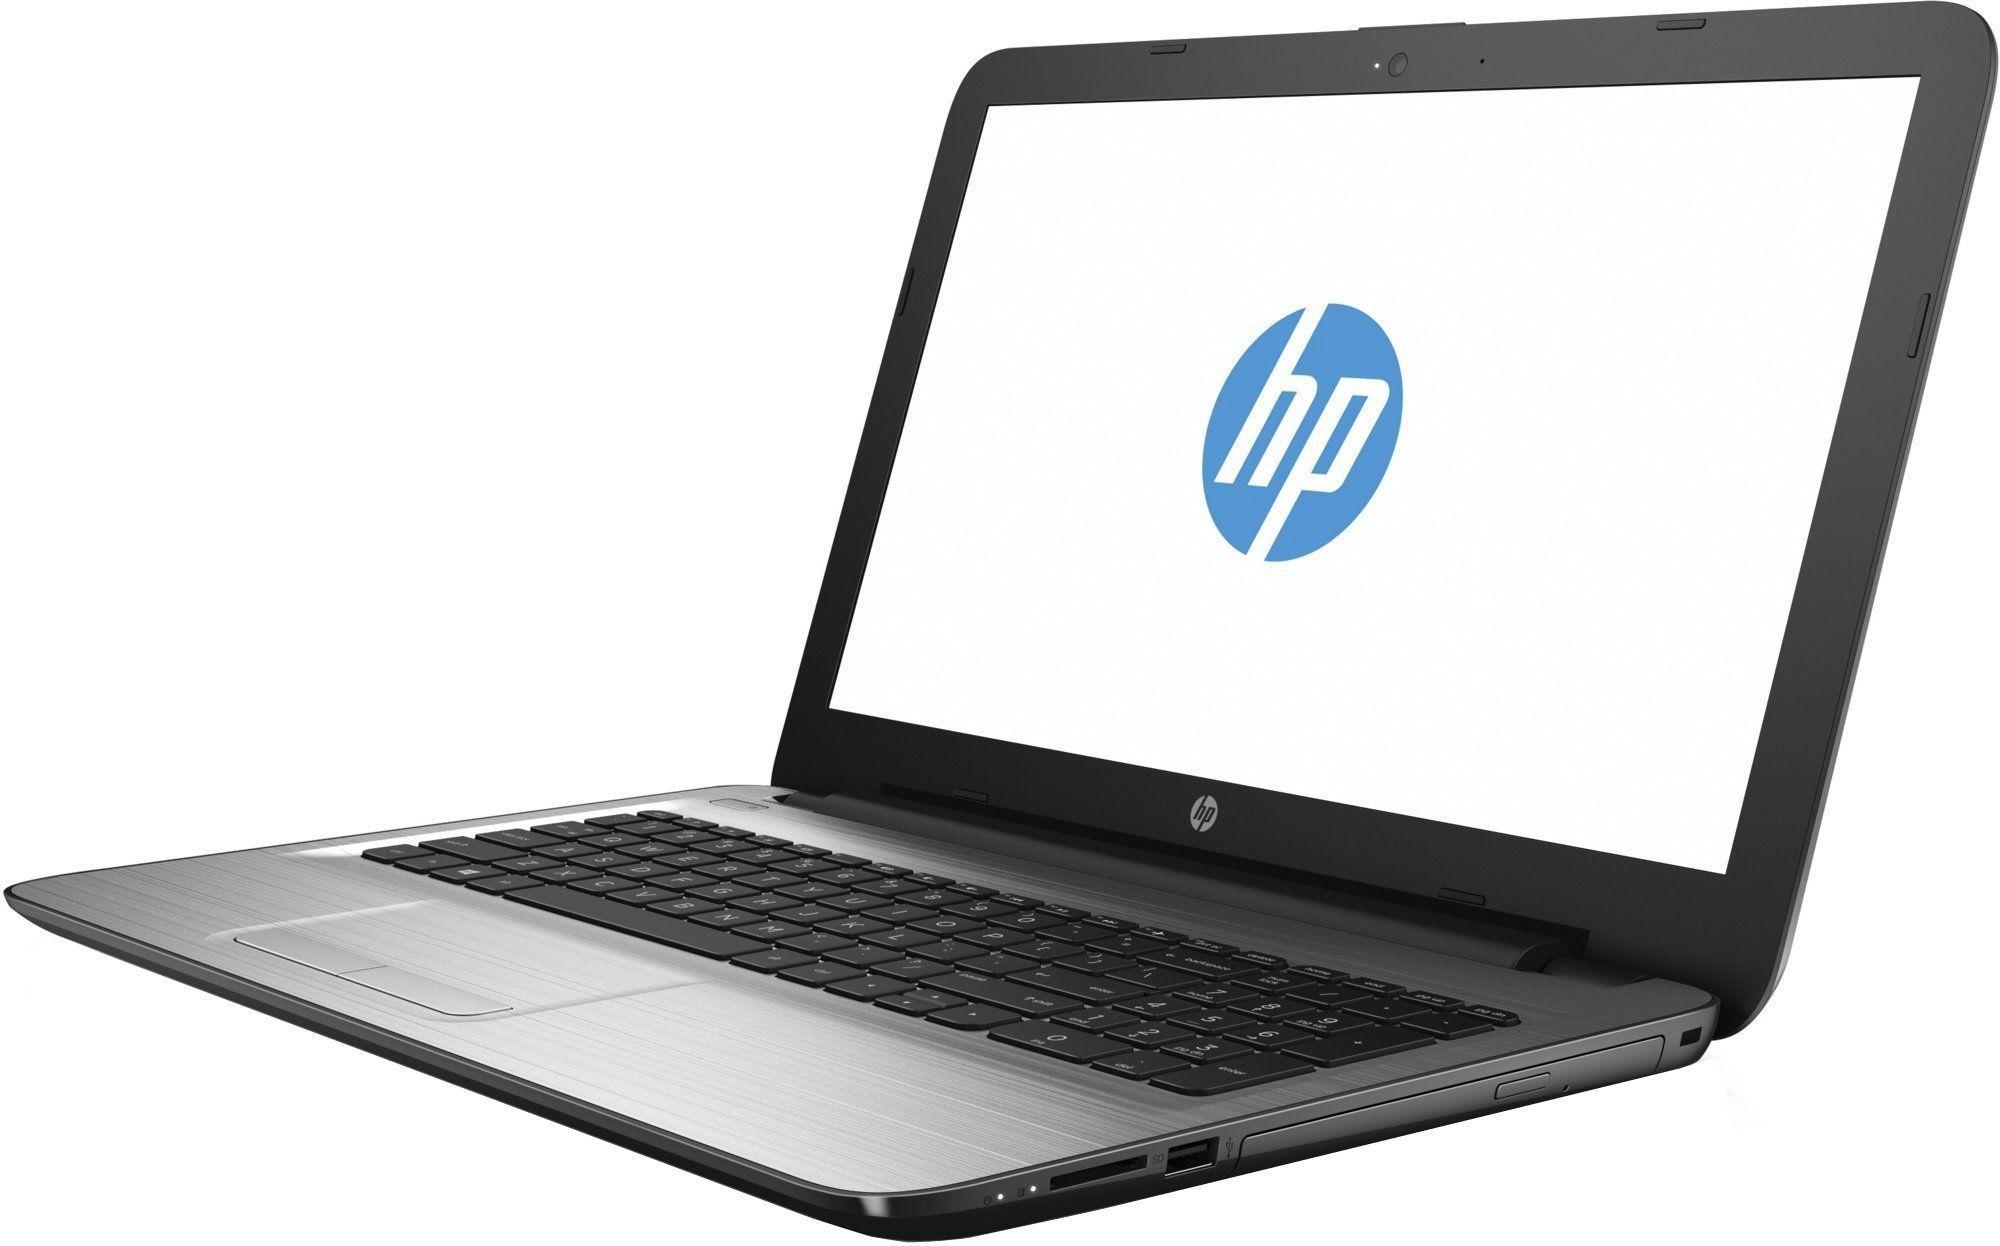 Купить Ноутбук HP 250 G5 (W4N22EA) фото 2